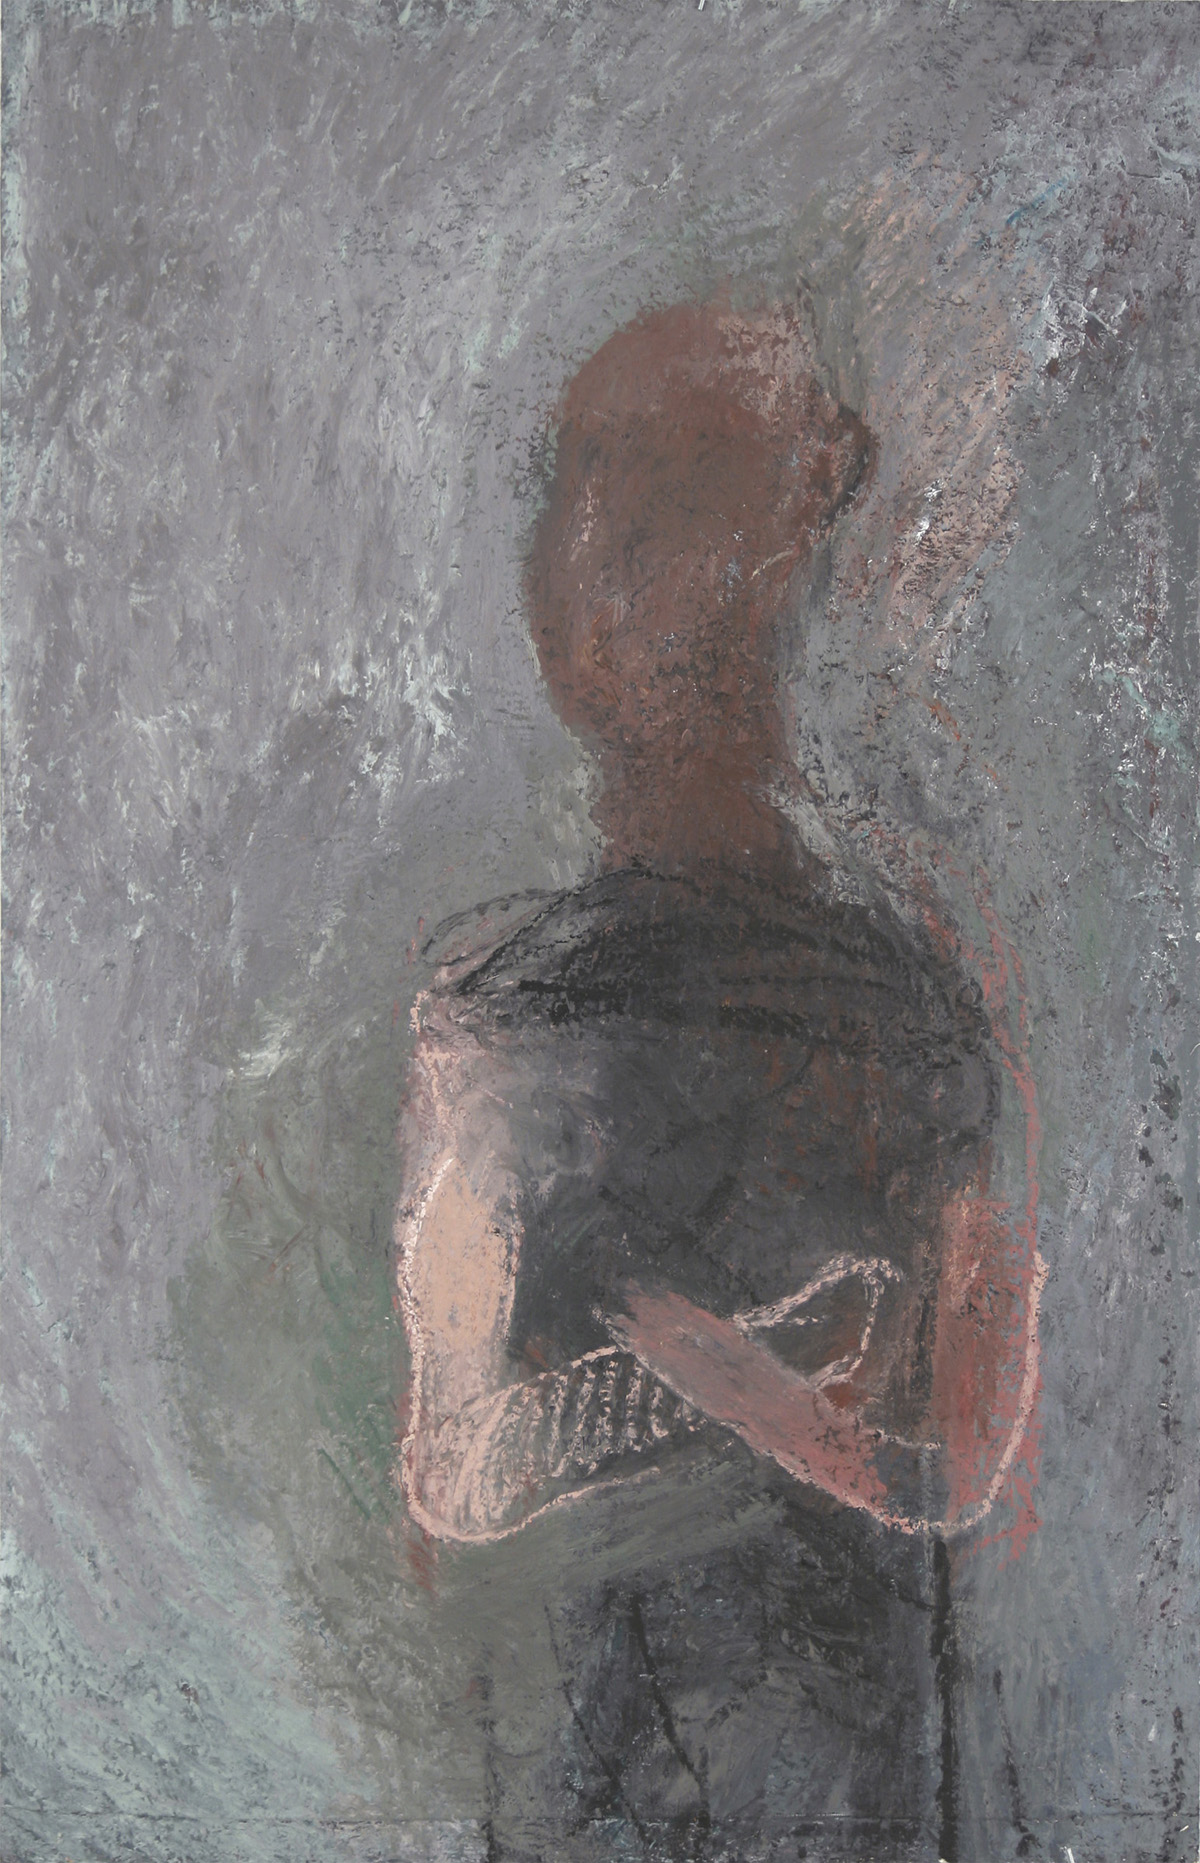 Thaddeus Radell